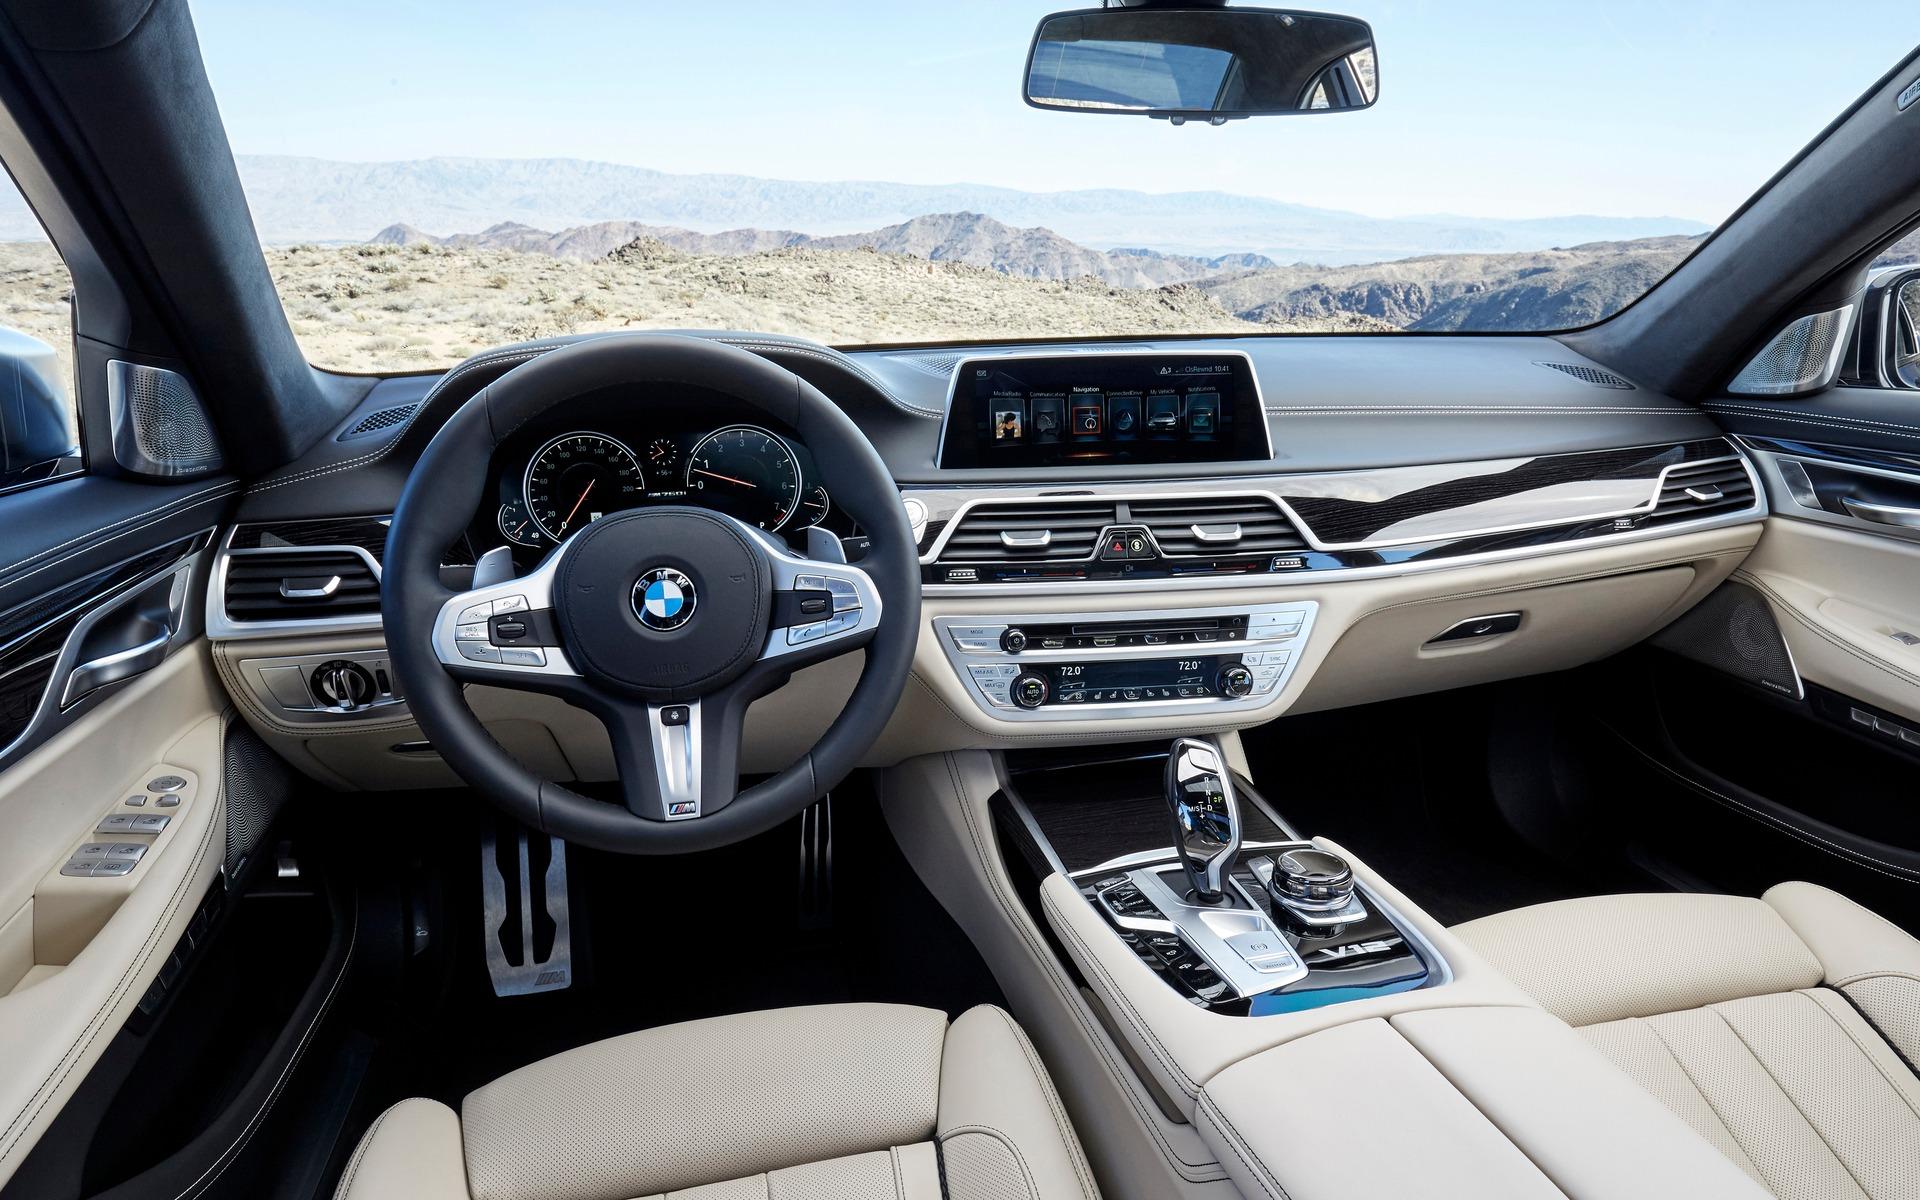 2018 BMW M760Li xDrive: An M7 Light - The Car Guide